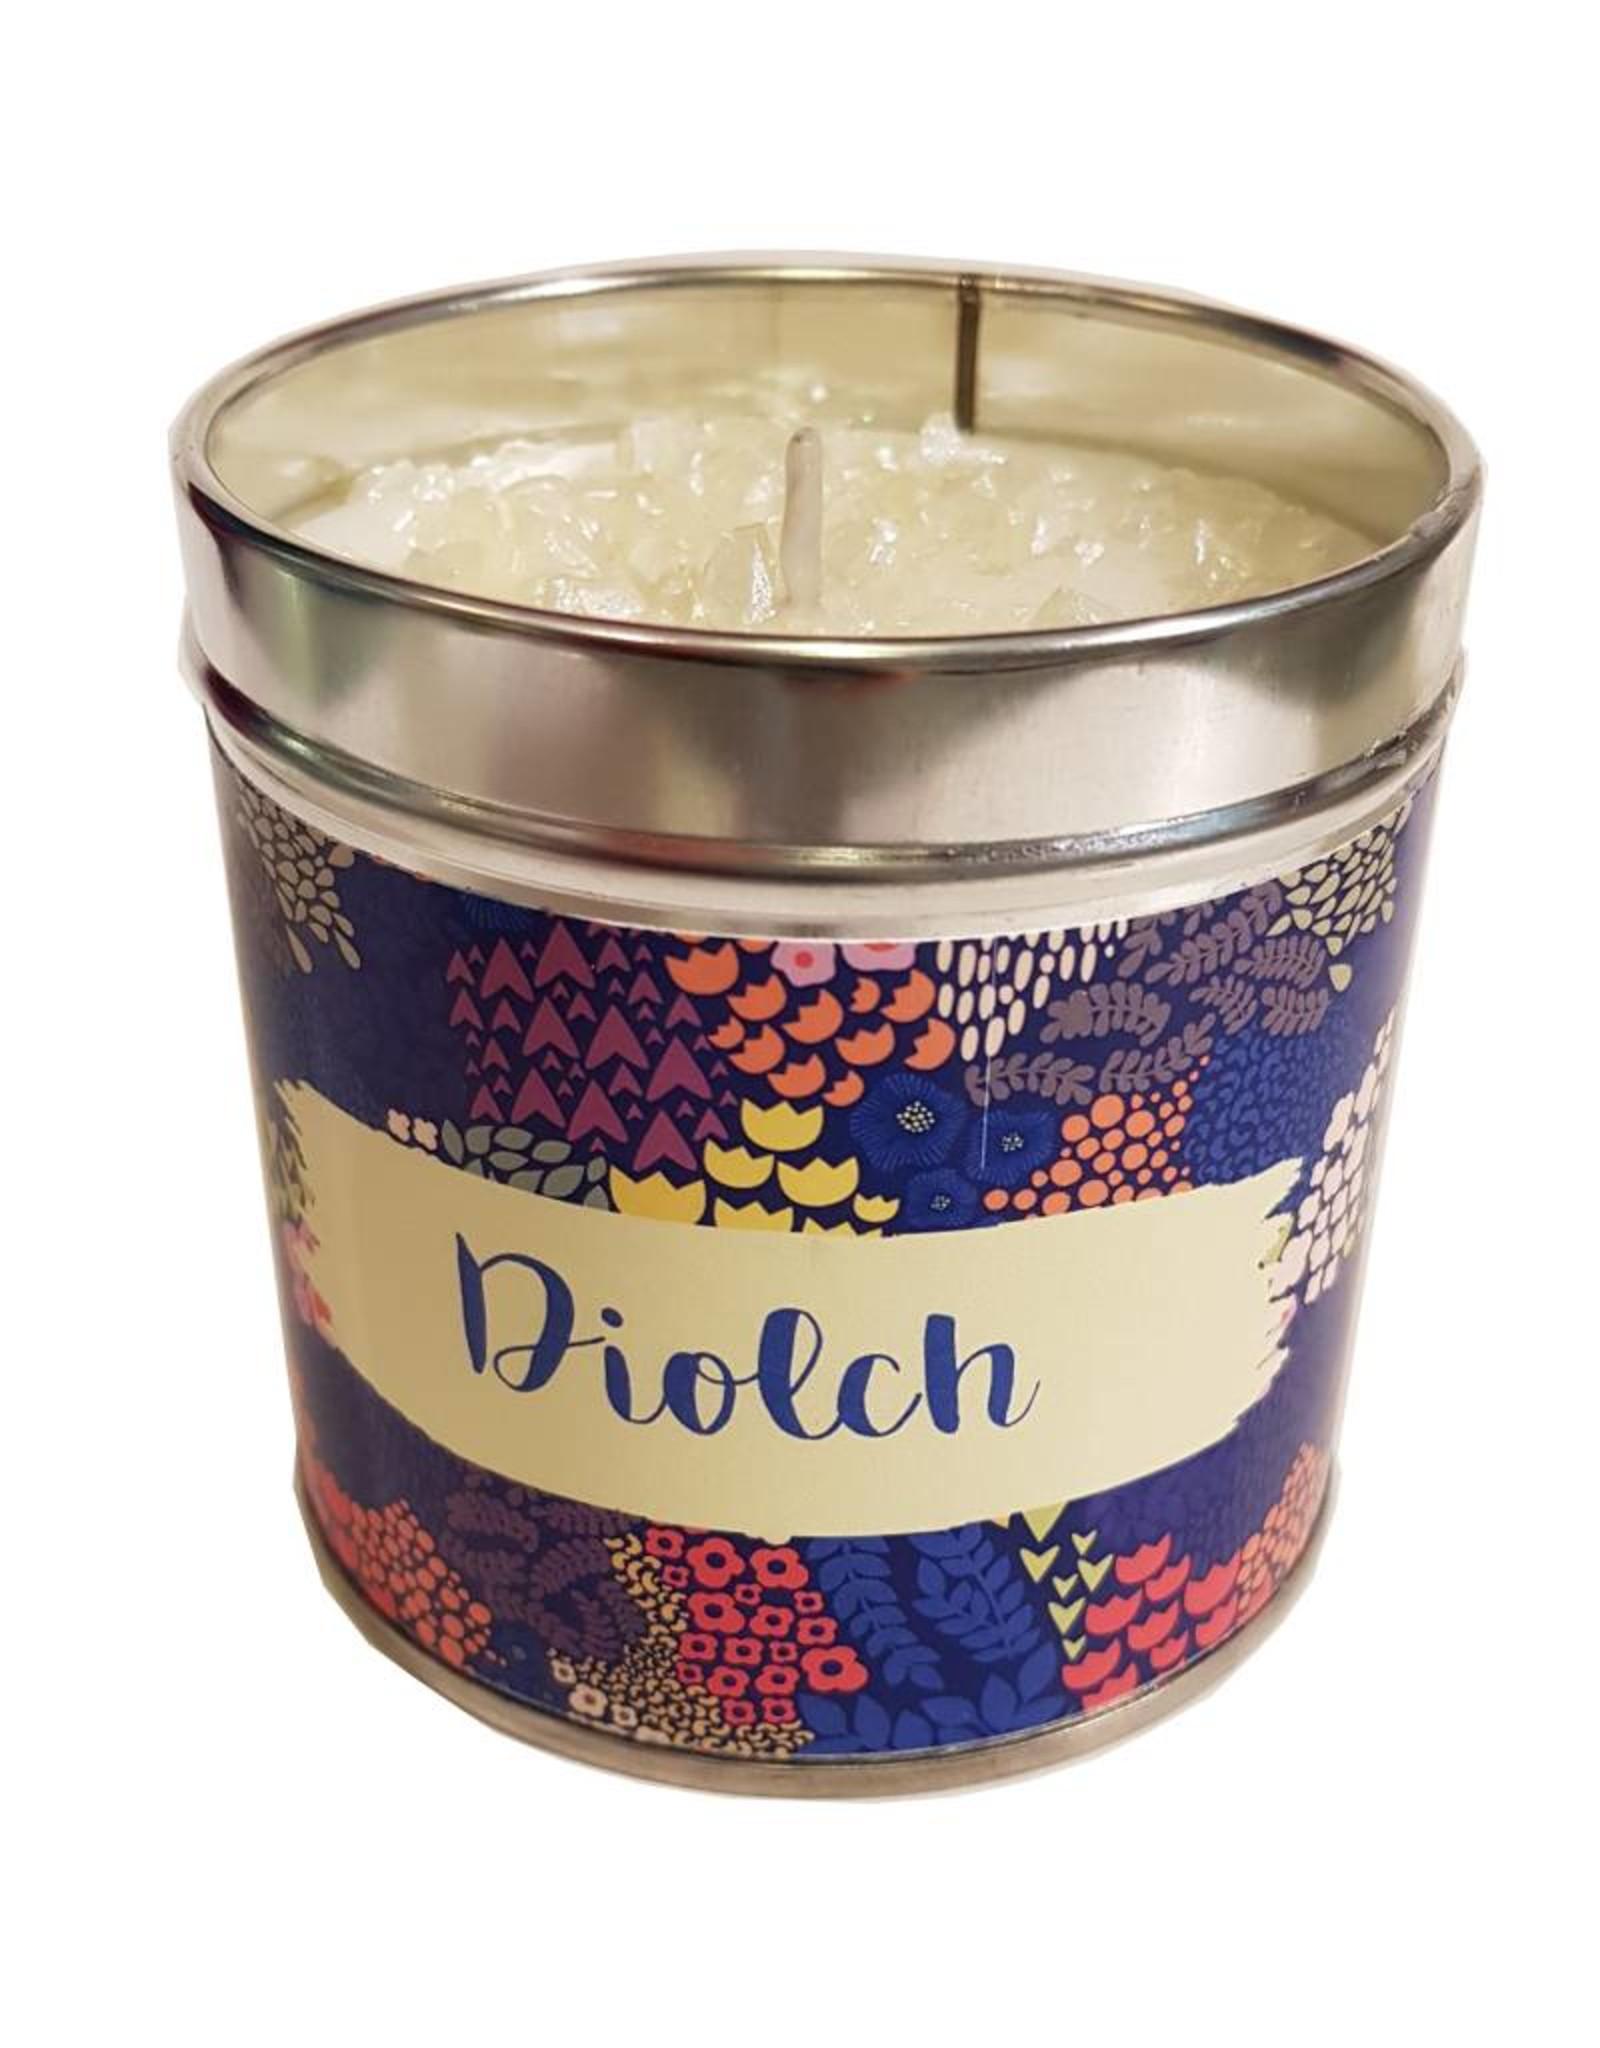 Cardigan Bay Company Diolch Candle